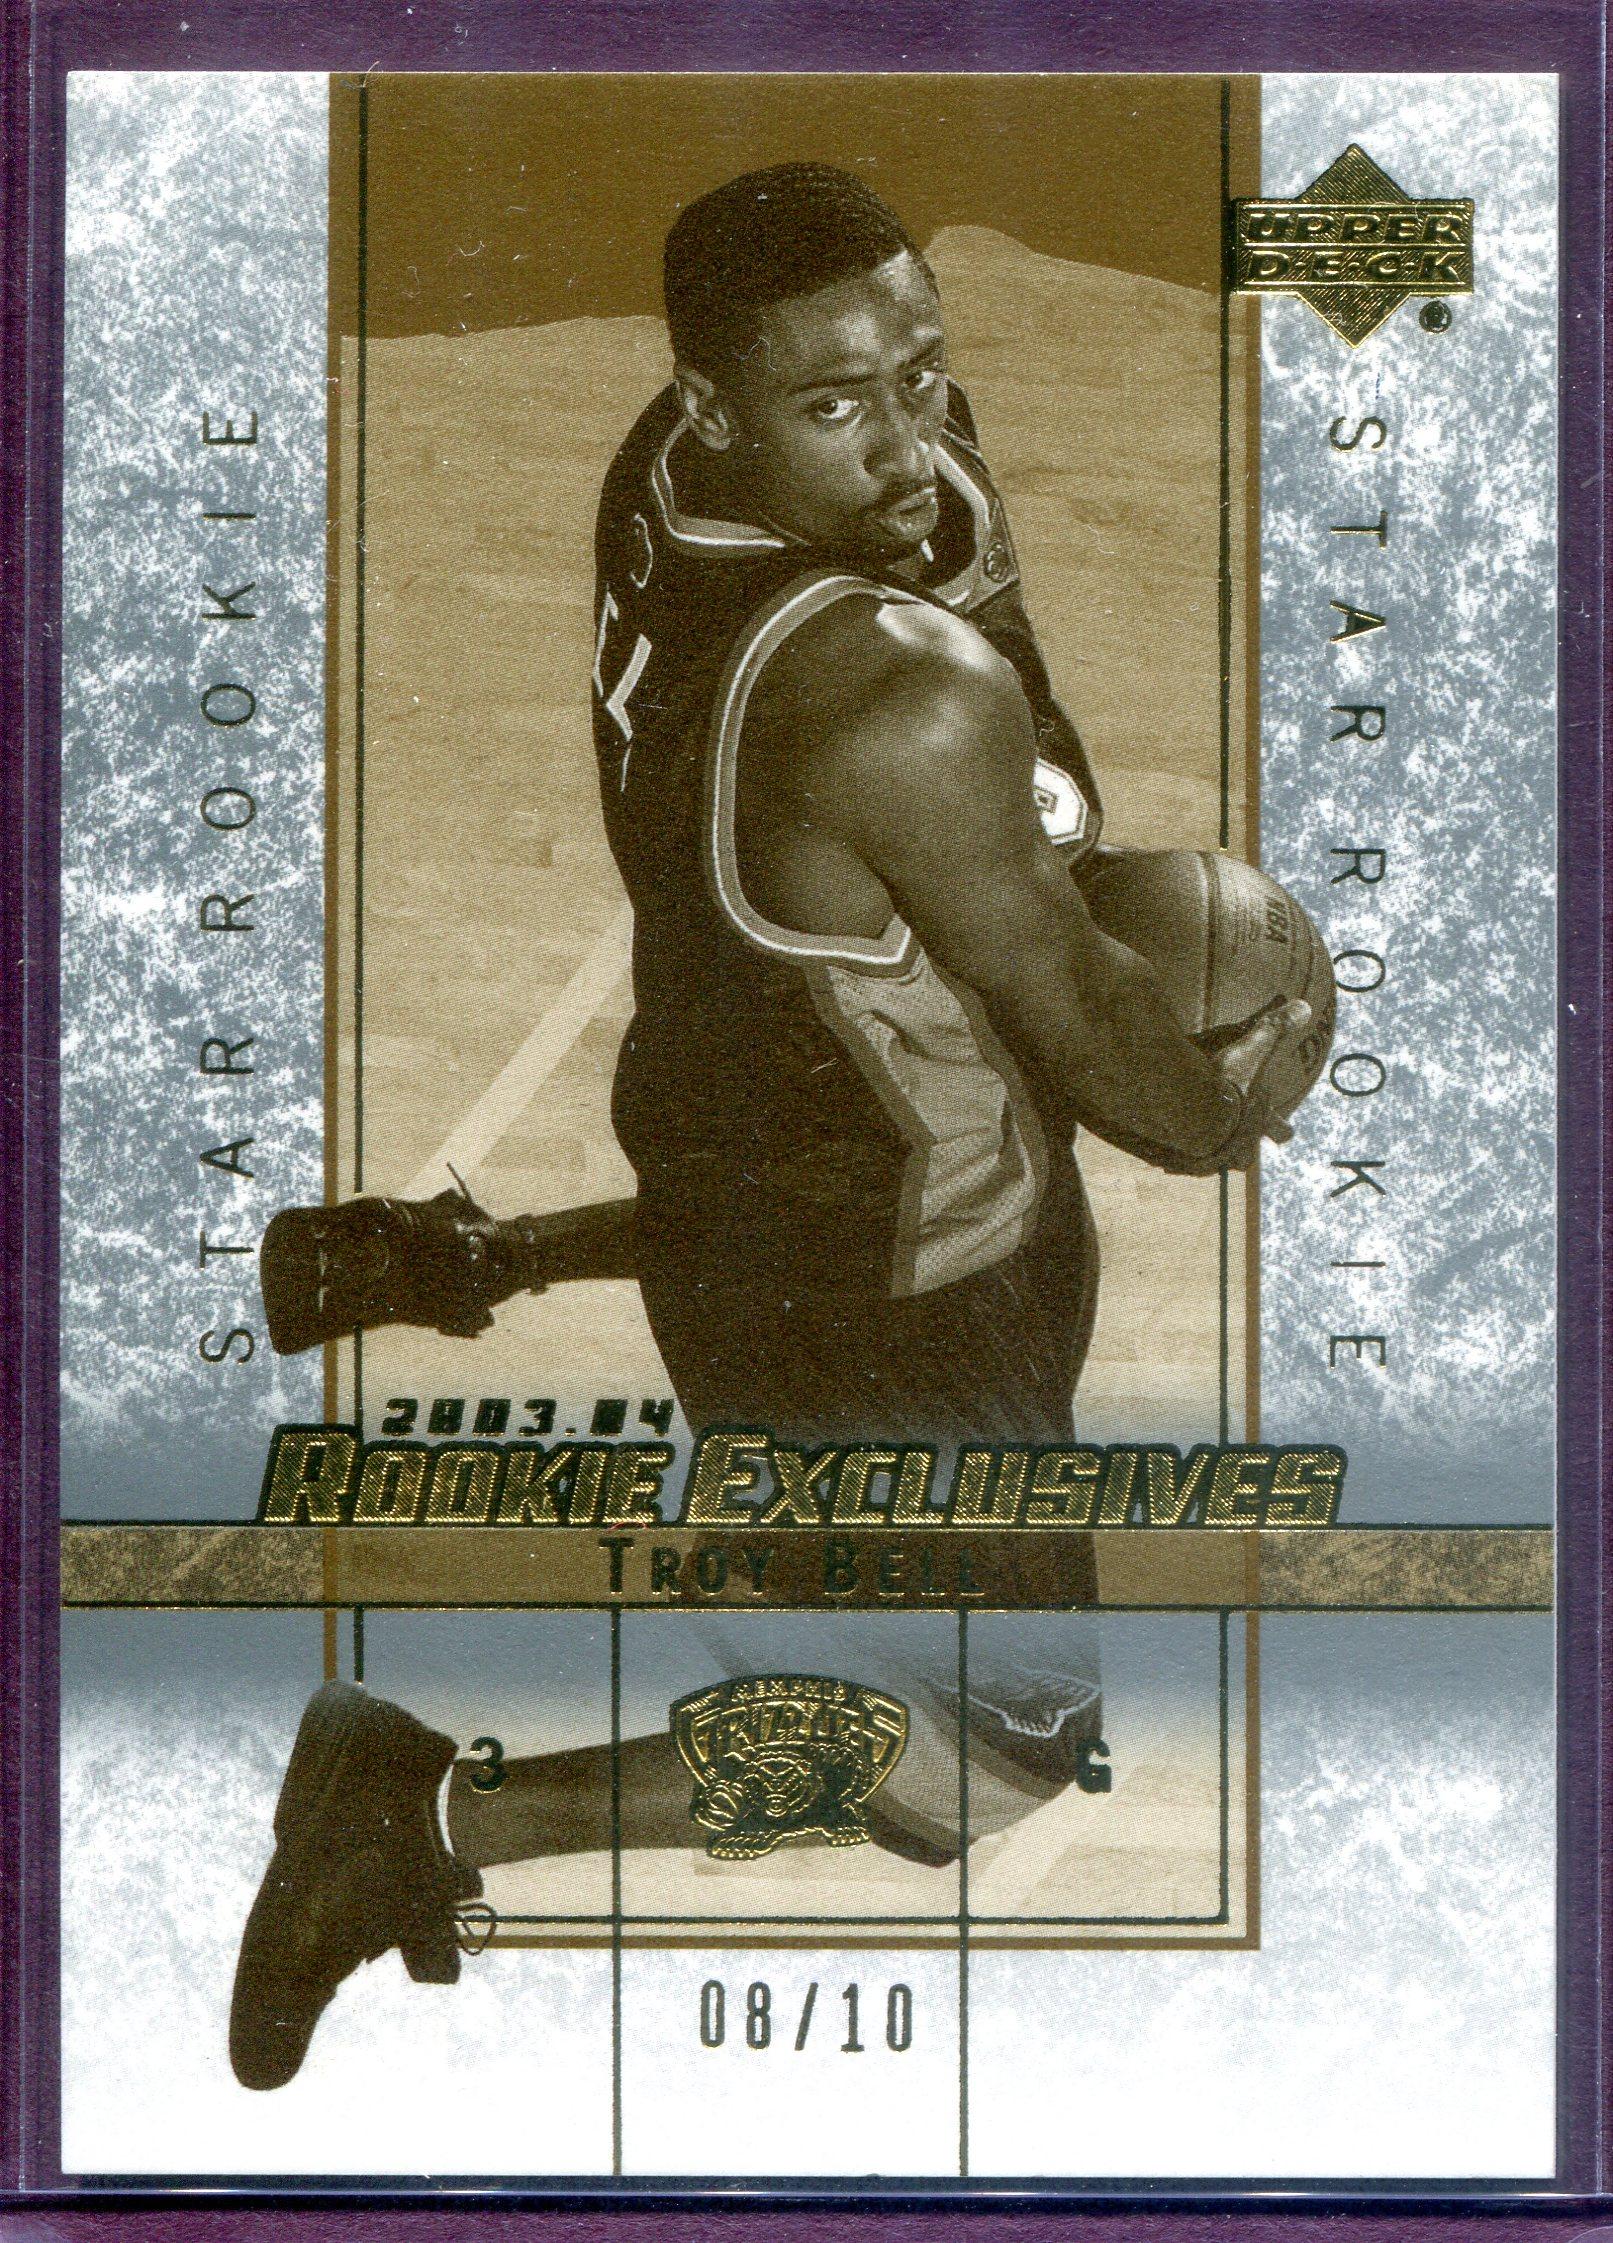 2003-04 Upper Deck Rookie Exclusives Variation Super #12 Troy Bell